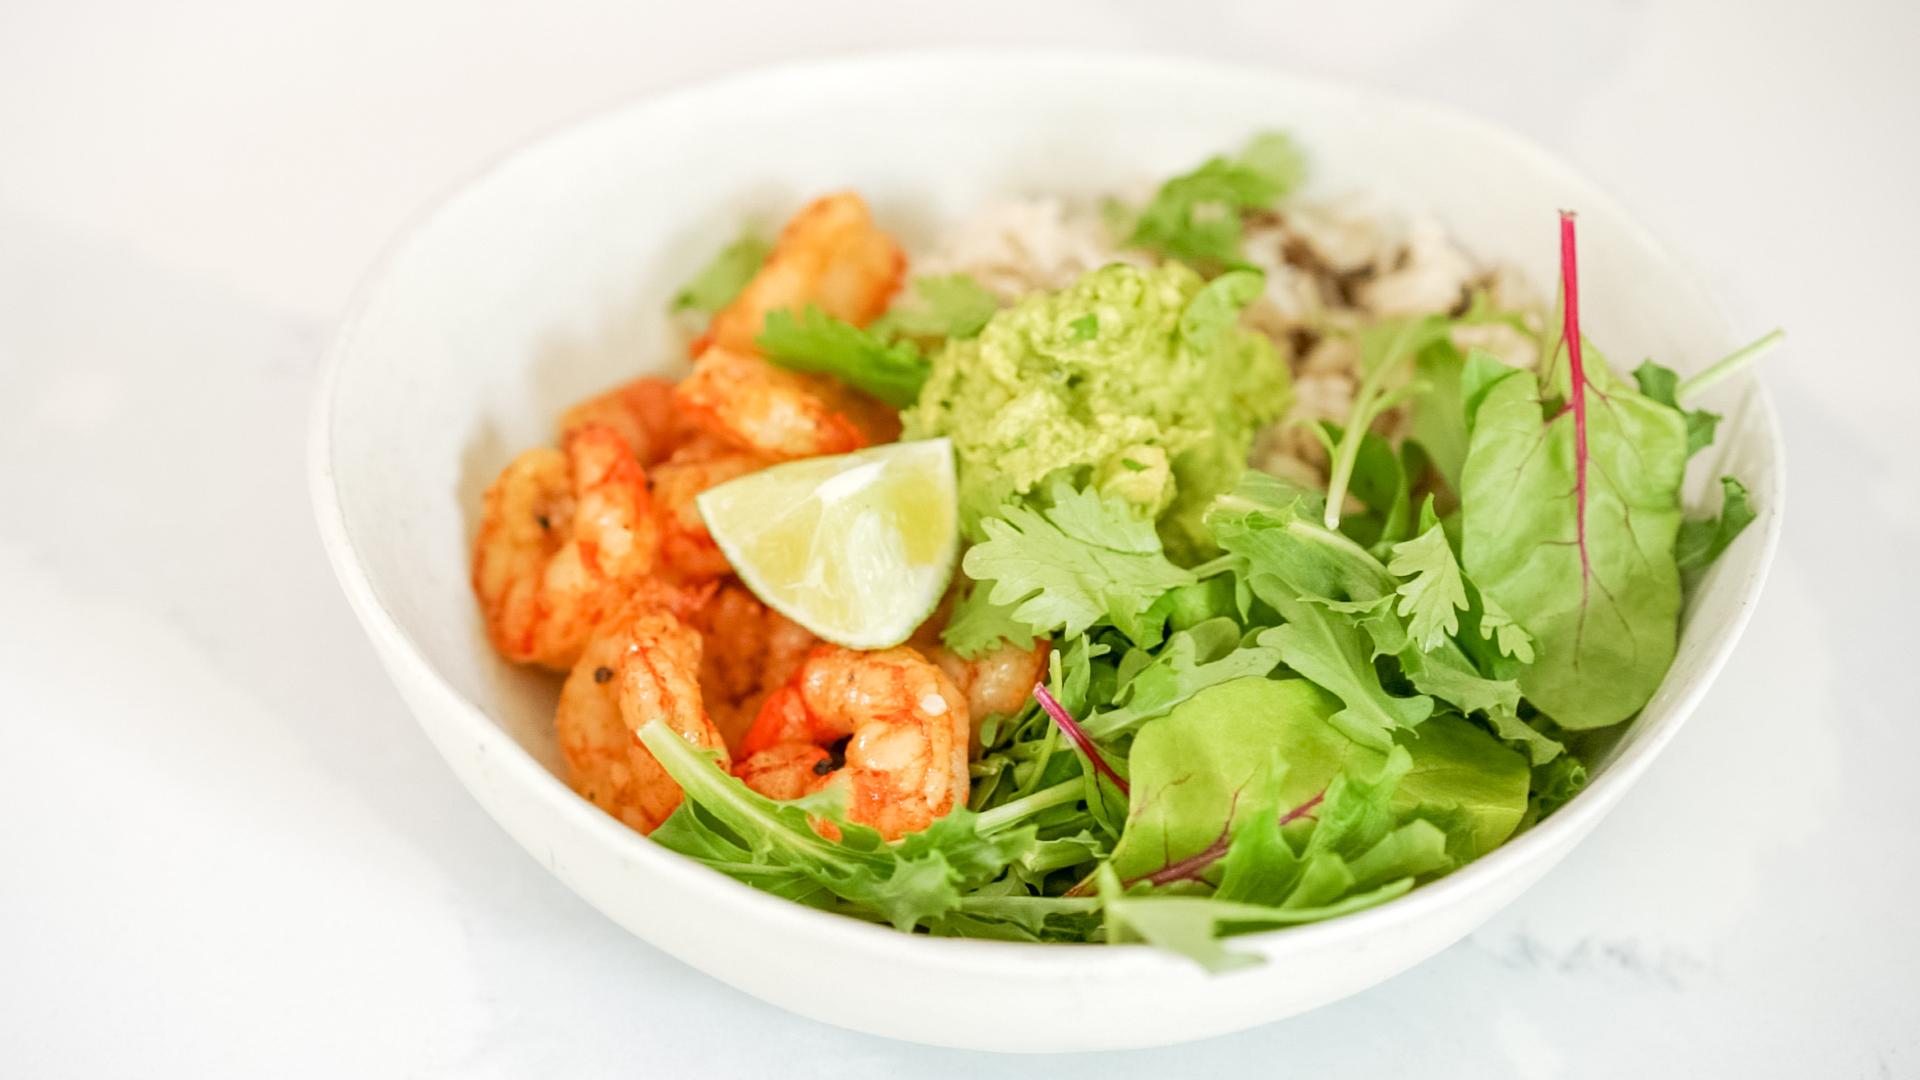 a bowl of taco spiced shrimp, rice, guacamole and salad